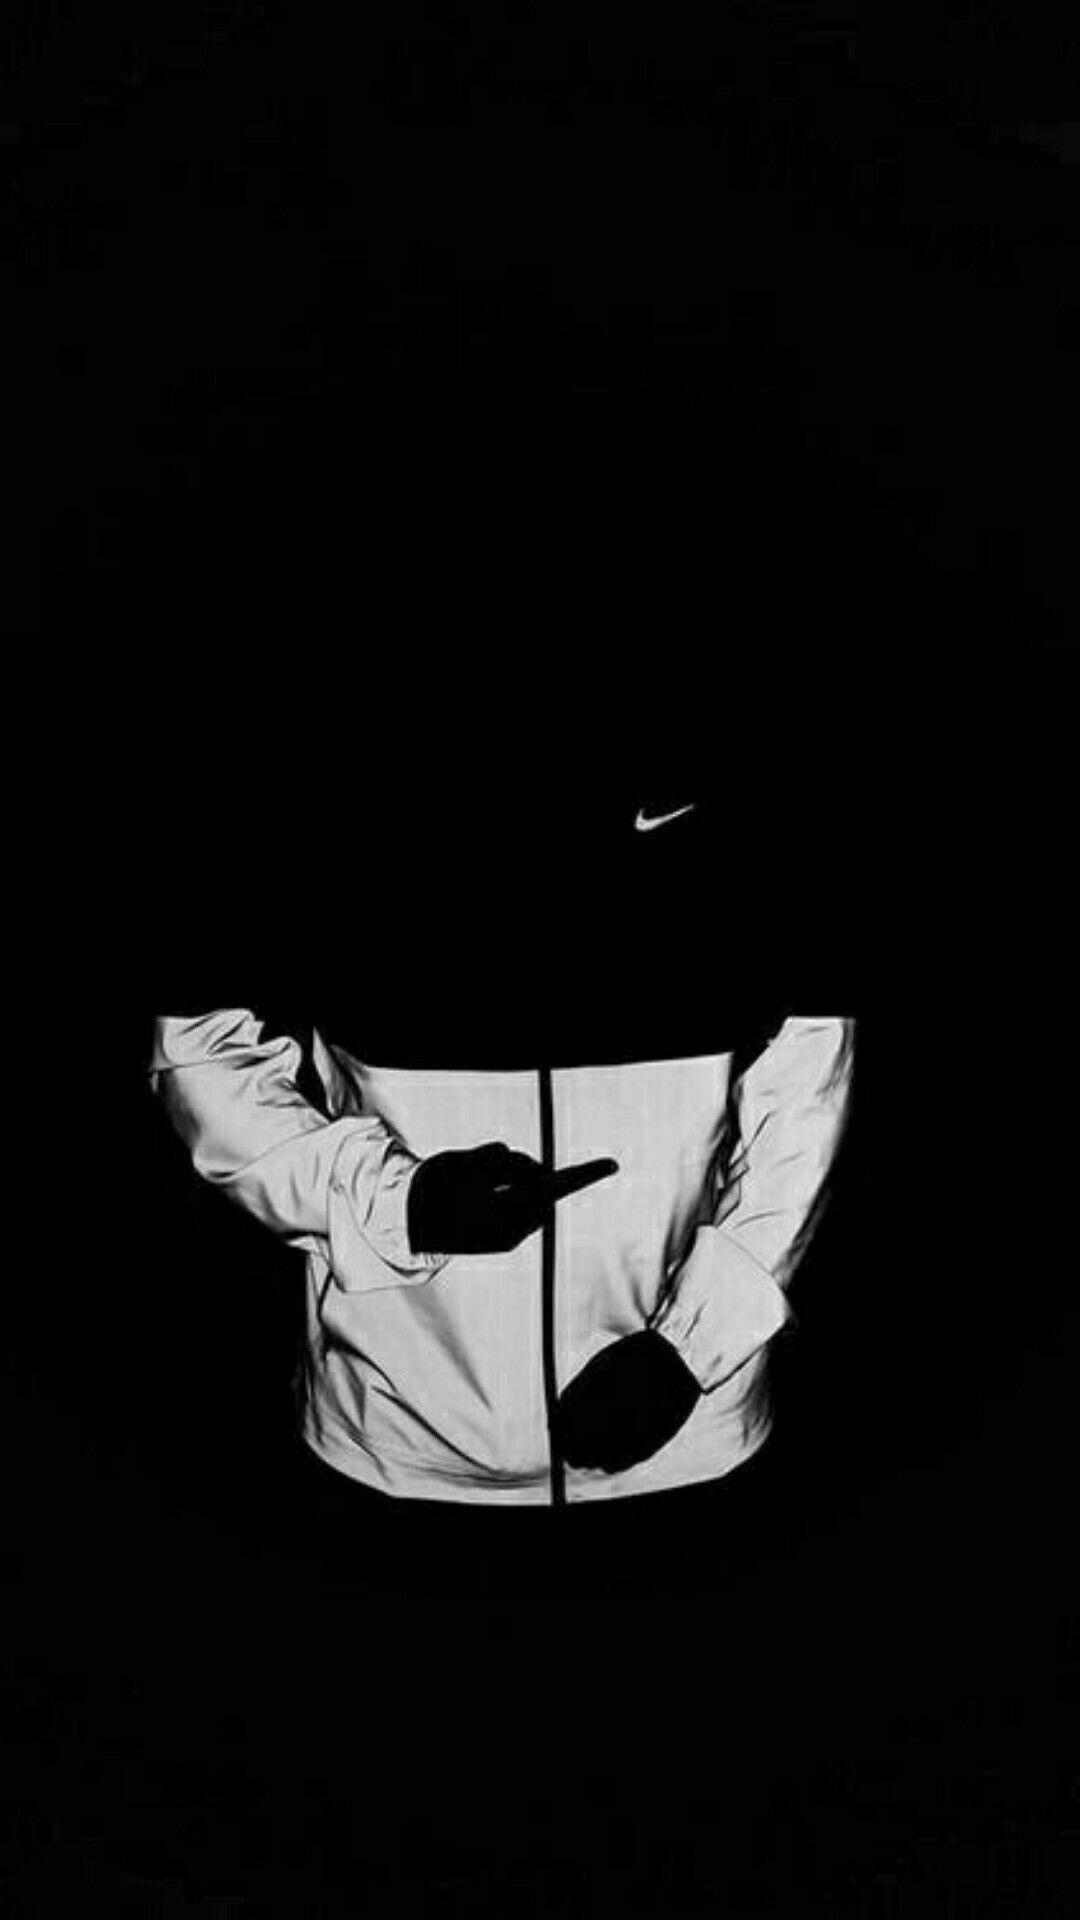 70 Black Nike Wallpapers On Wallpaperplay Nike Wallpaper Nike Wallpaper Iphone Nike Wallpaper Backgrounds